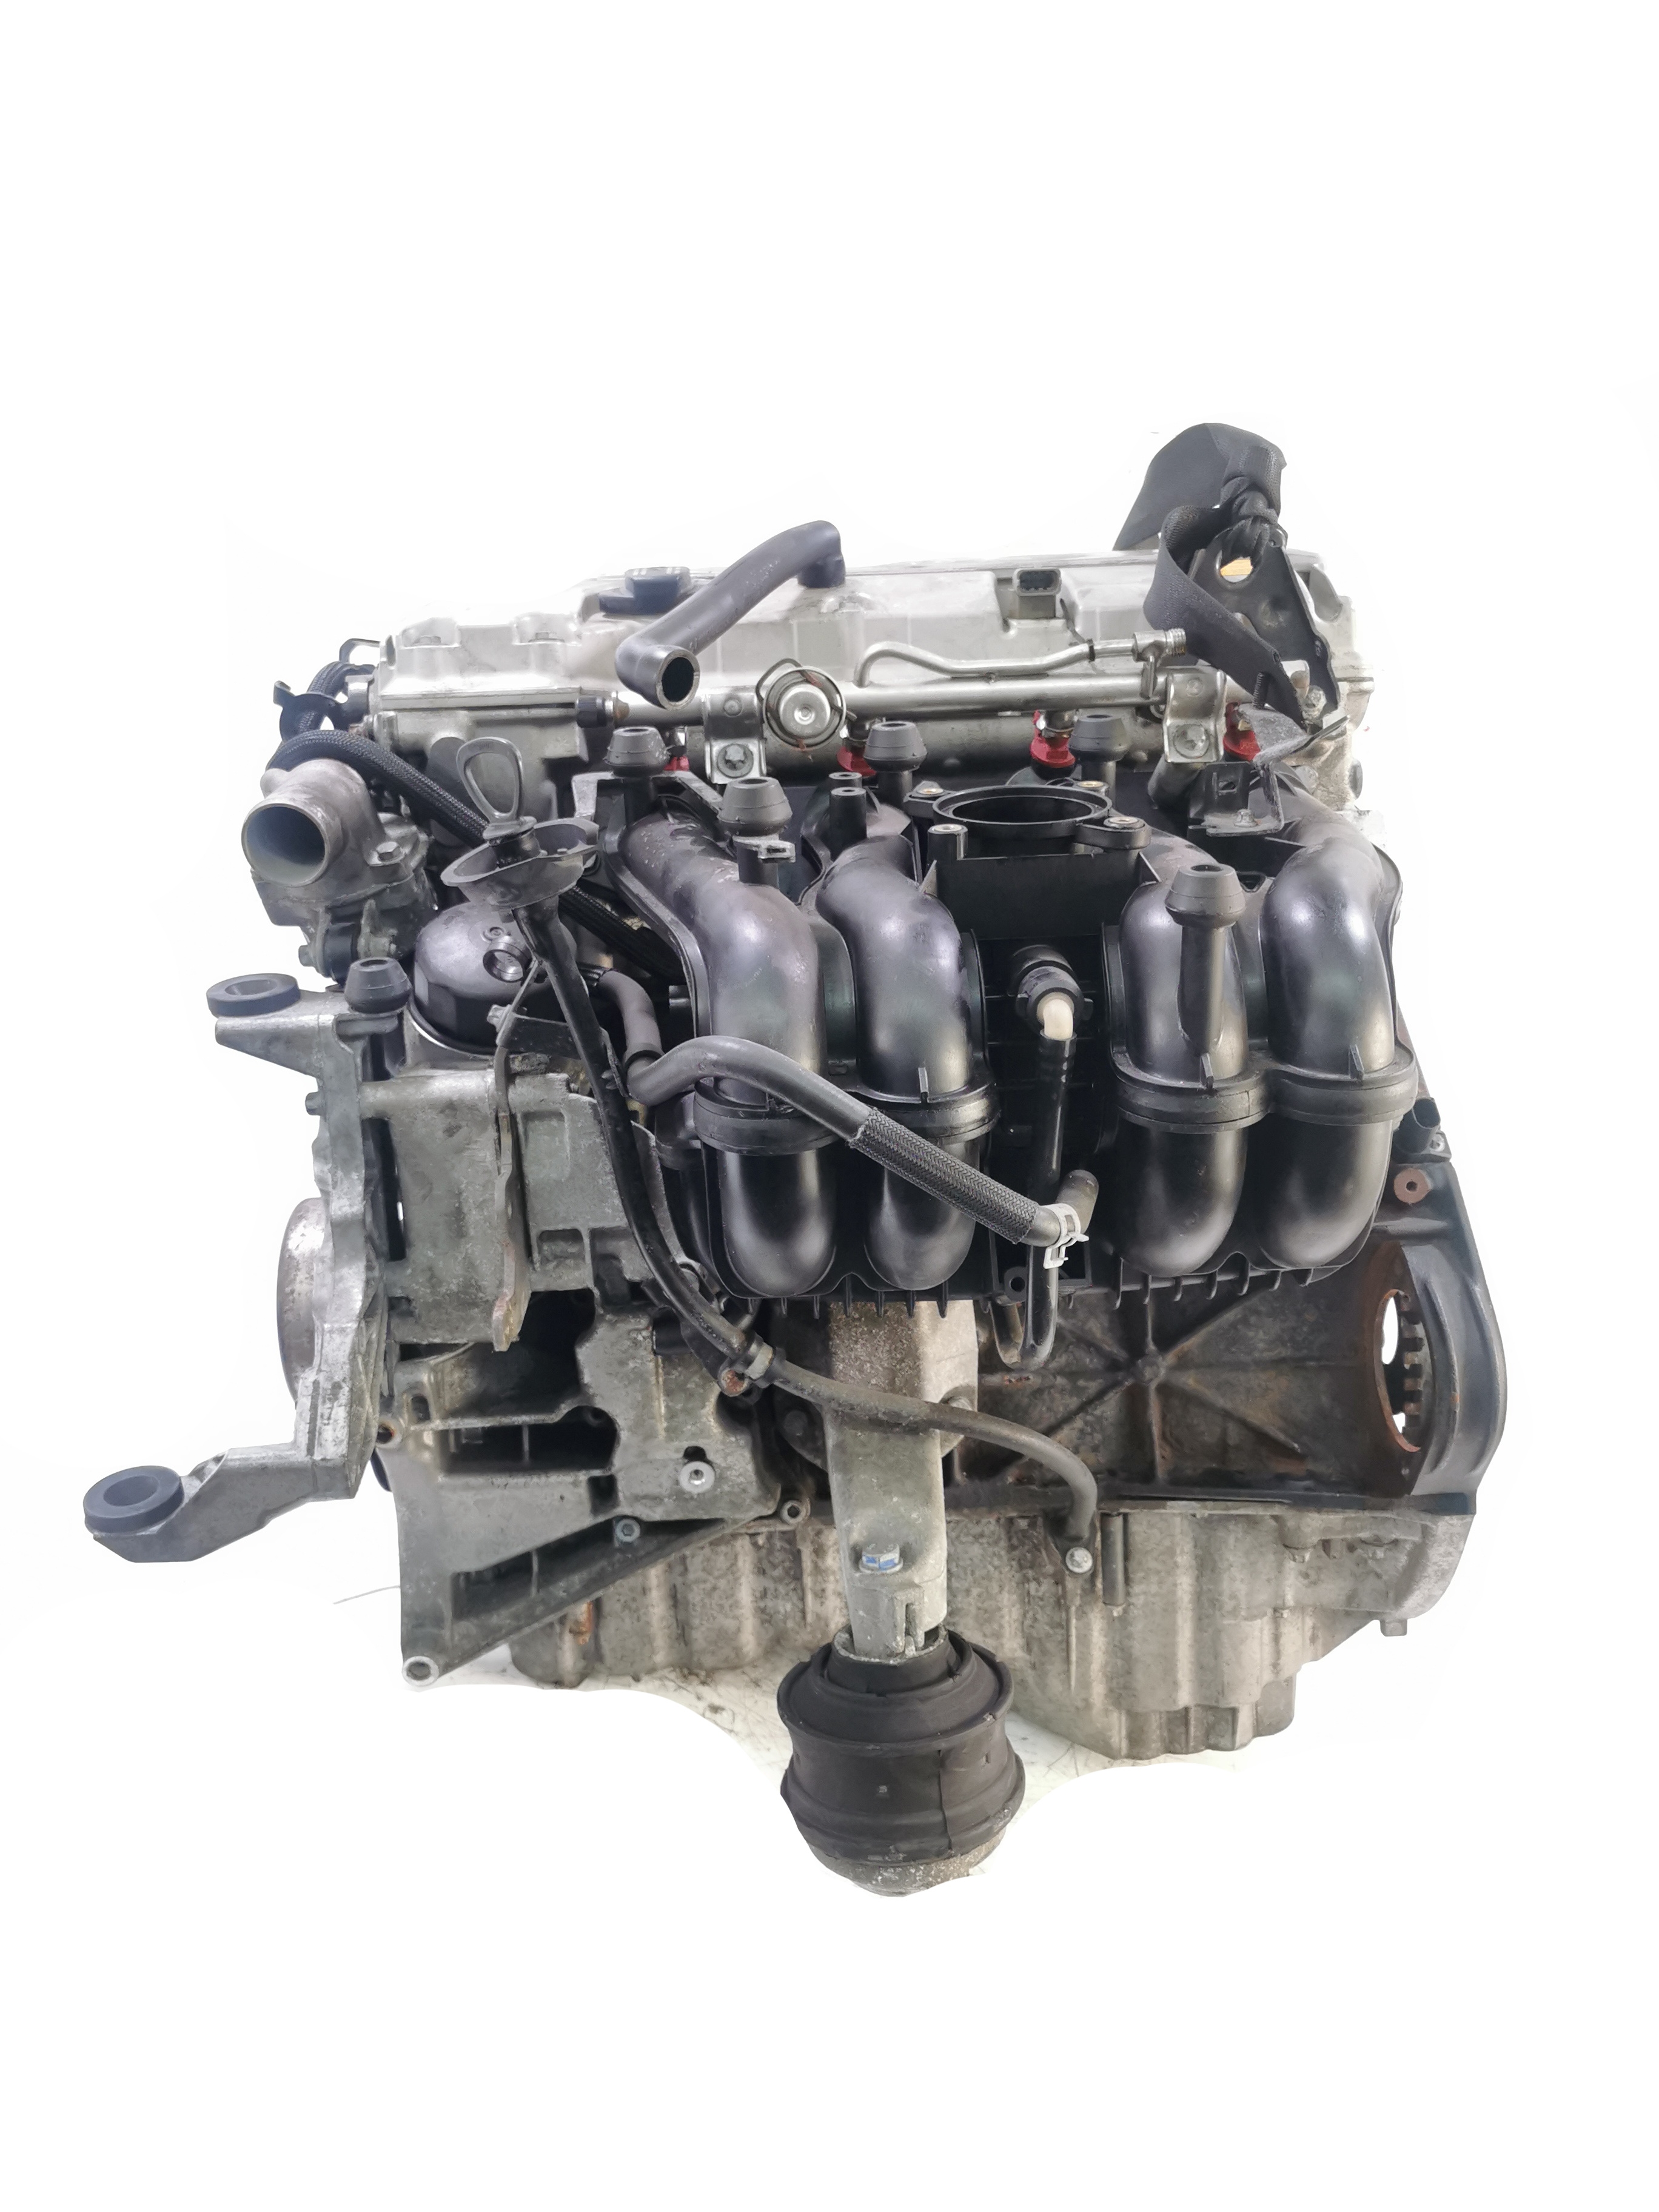 Motor mit Anbauteile Mercedes-Benz C-Klasse W203 C 180 2,0 M111 M111.951 111.951